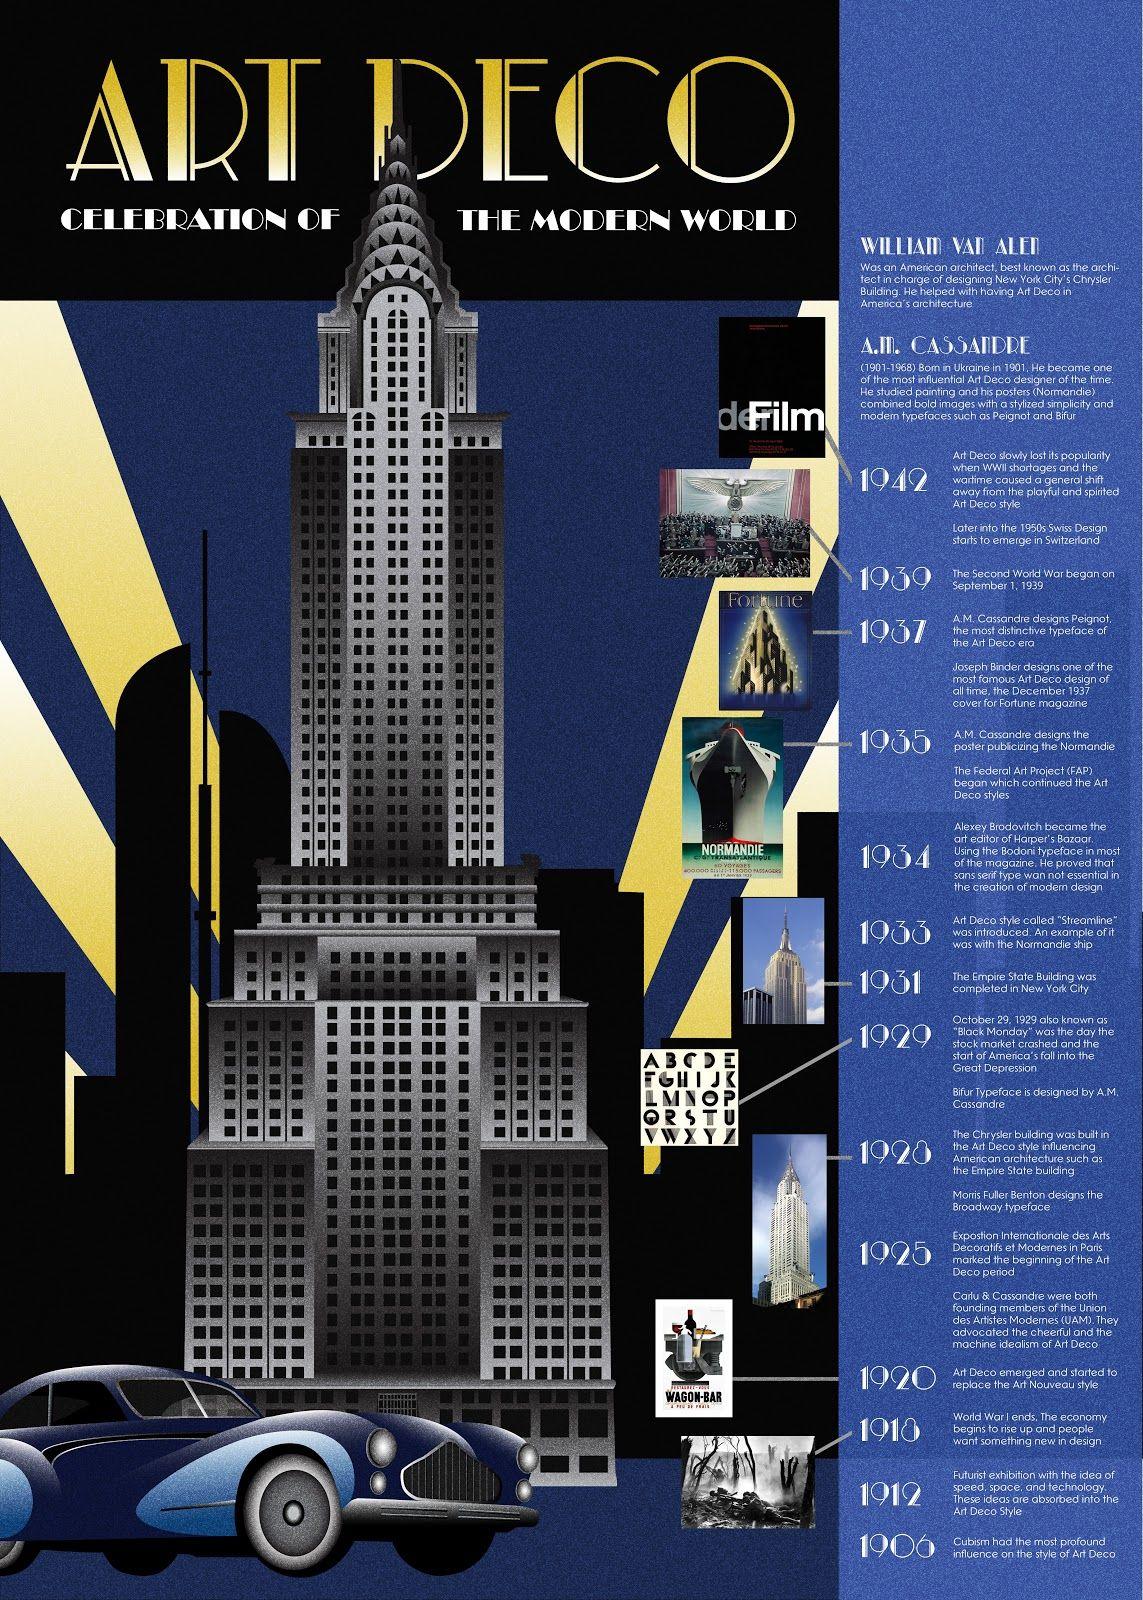 art deco infograph dates and descriptions chrysler. Black Bedroom Furniture Sets. Home Design Ideas